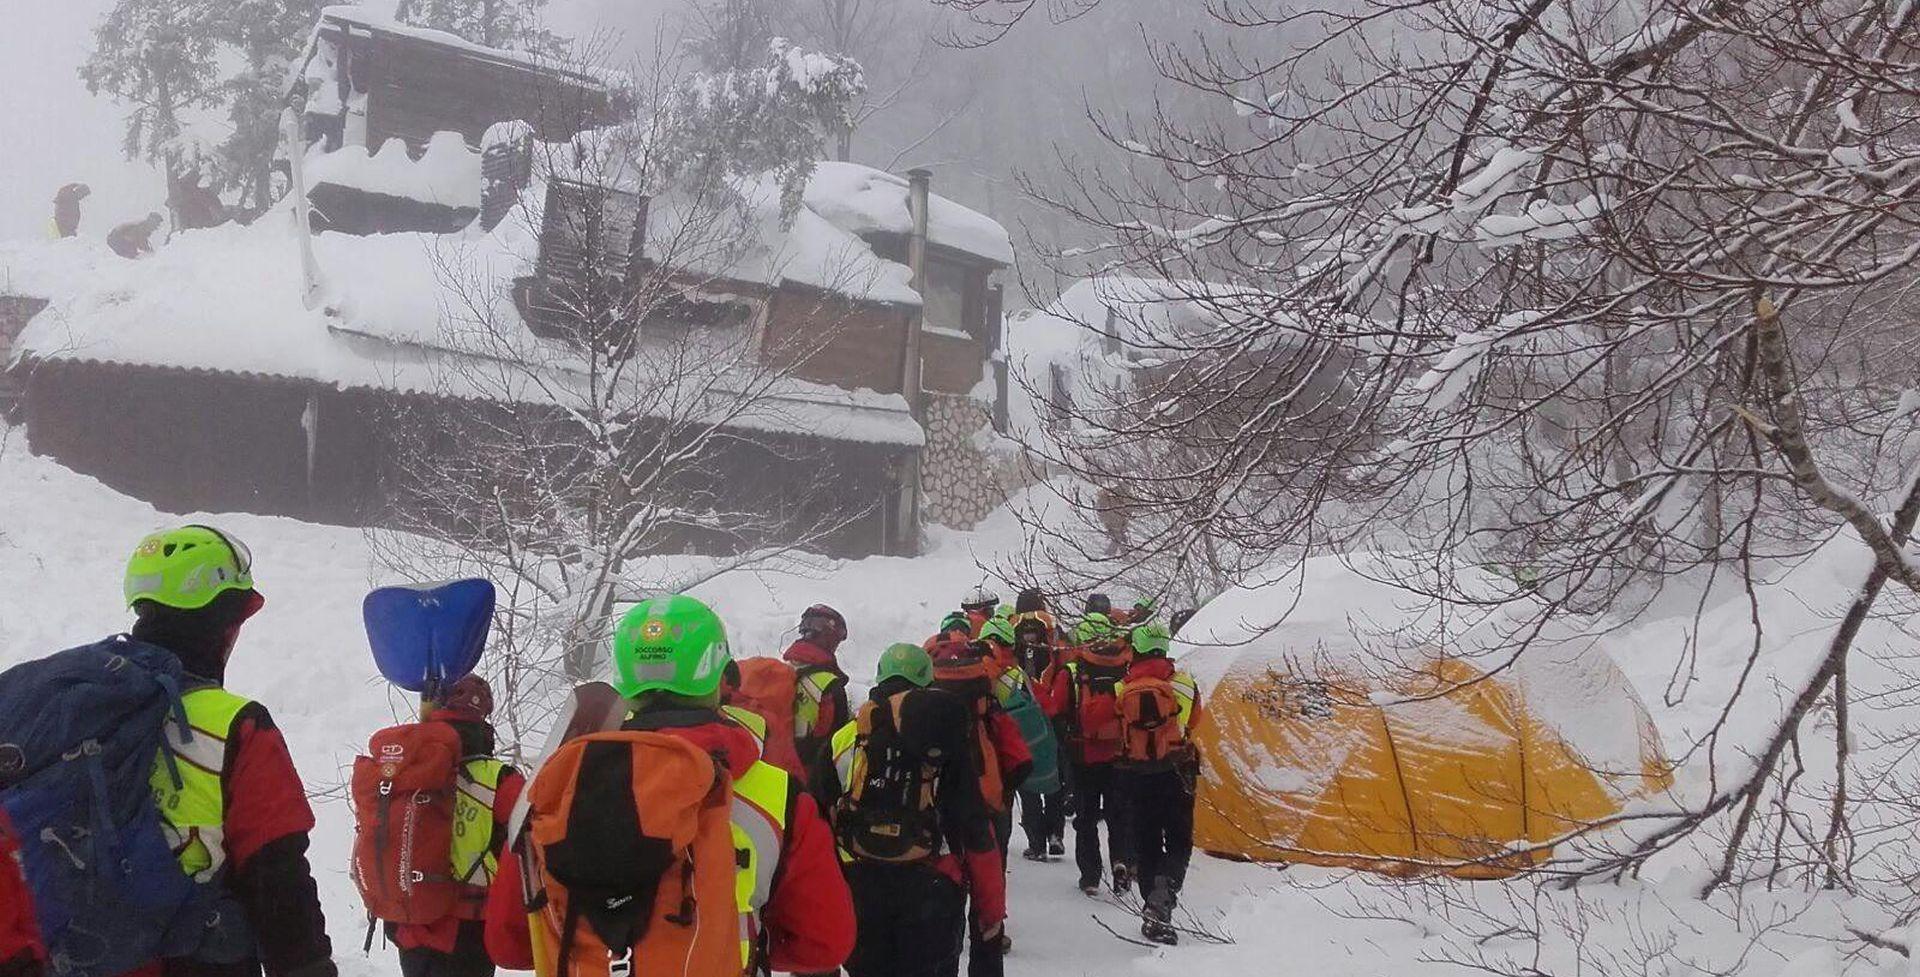 KATASTROFA U ITALIJI Menadžer zatrpanog hotela upozorio nadležne uoči lavine